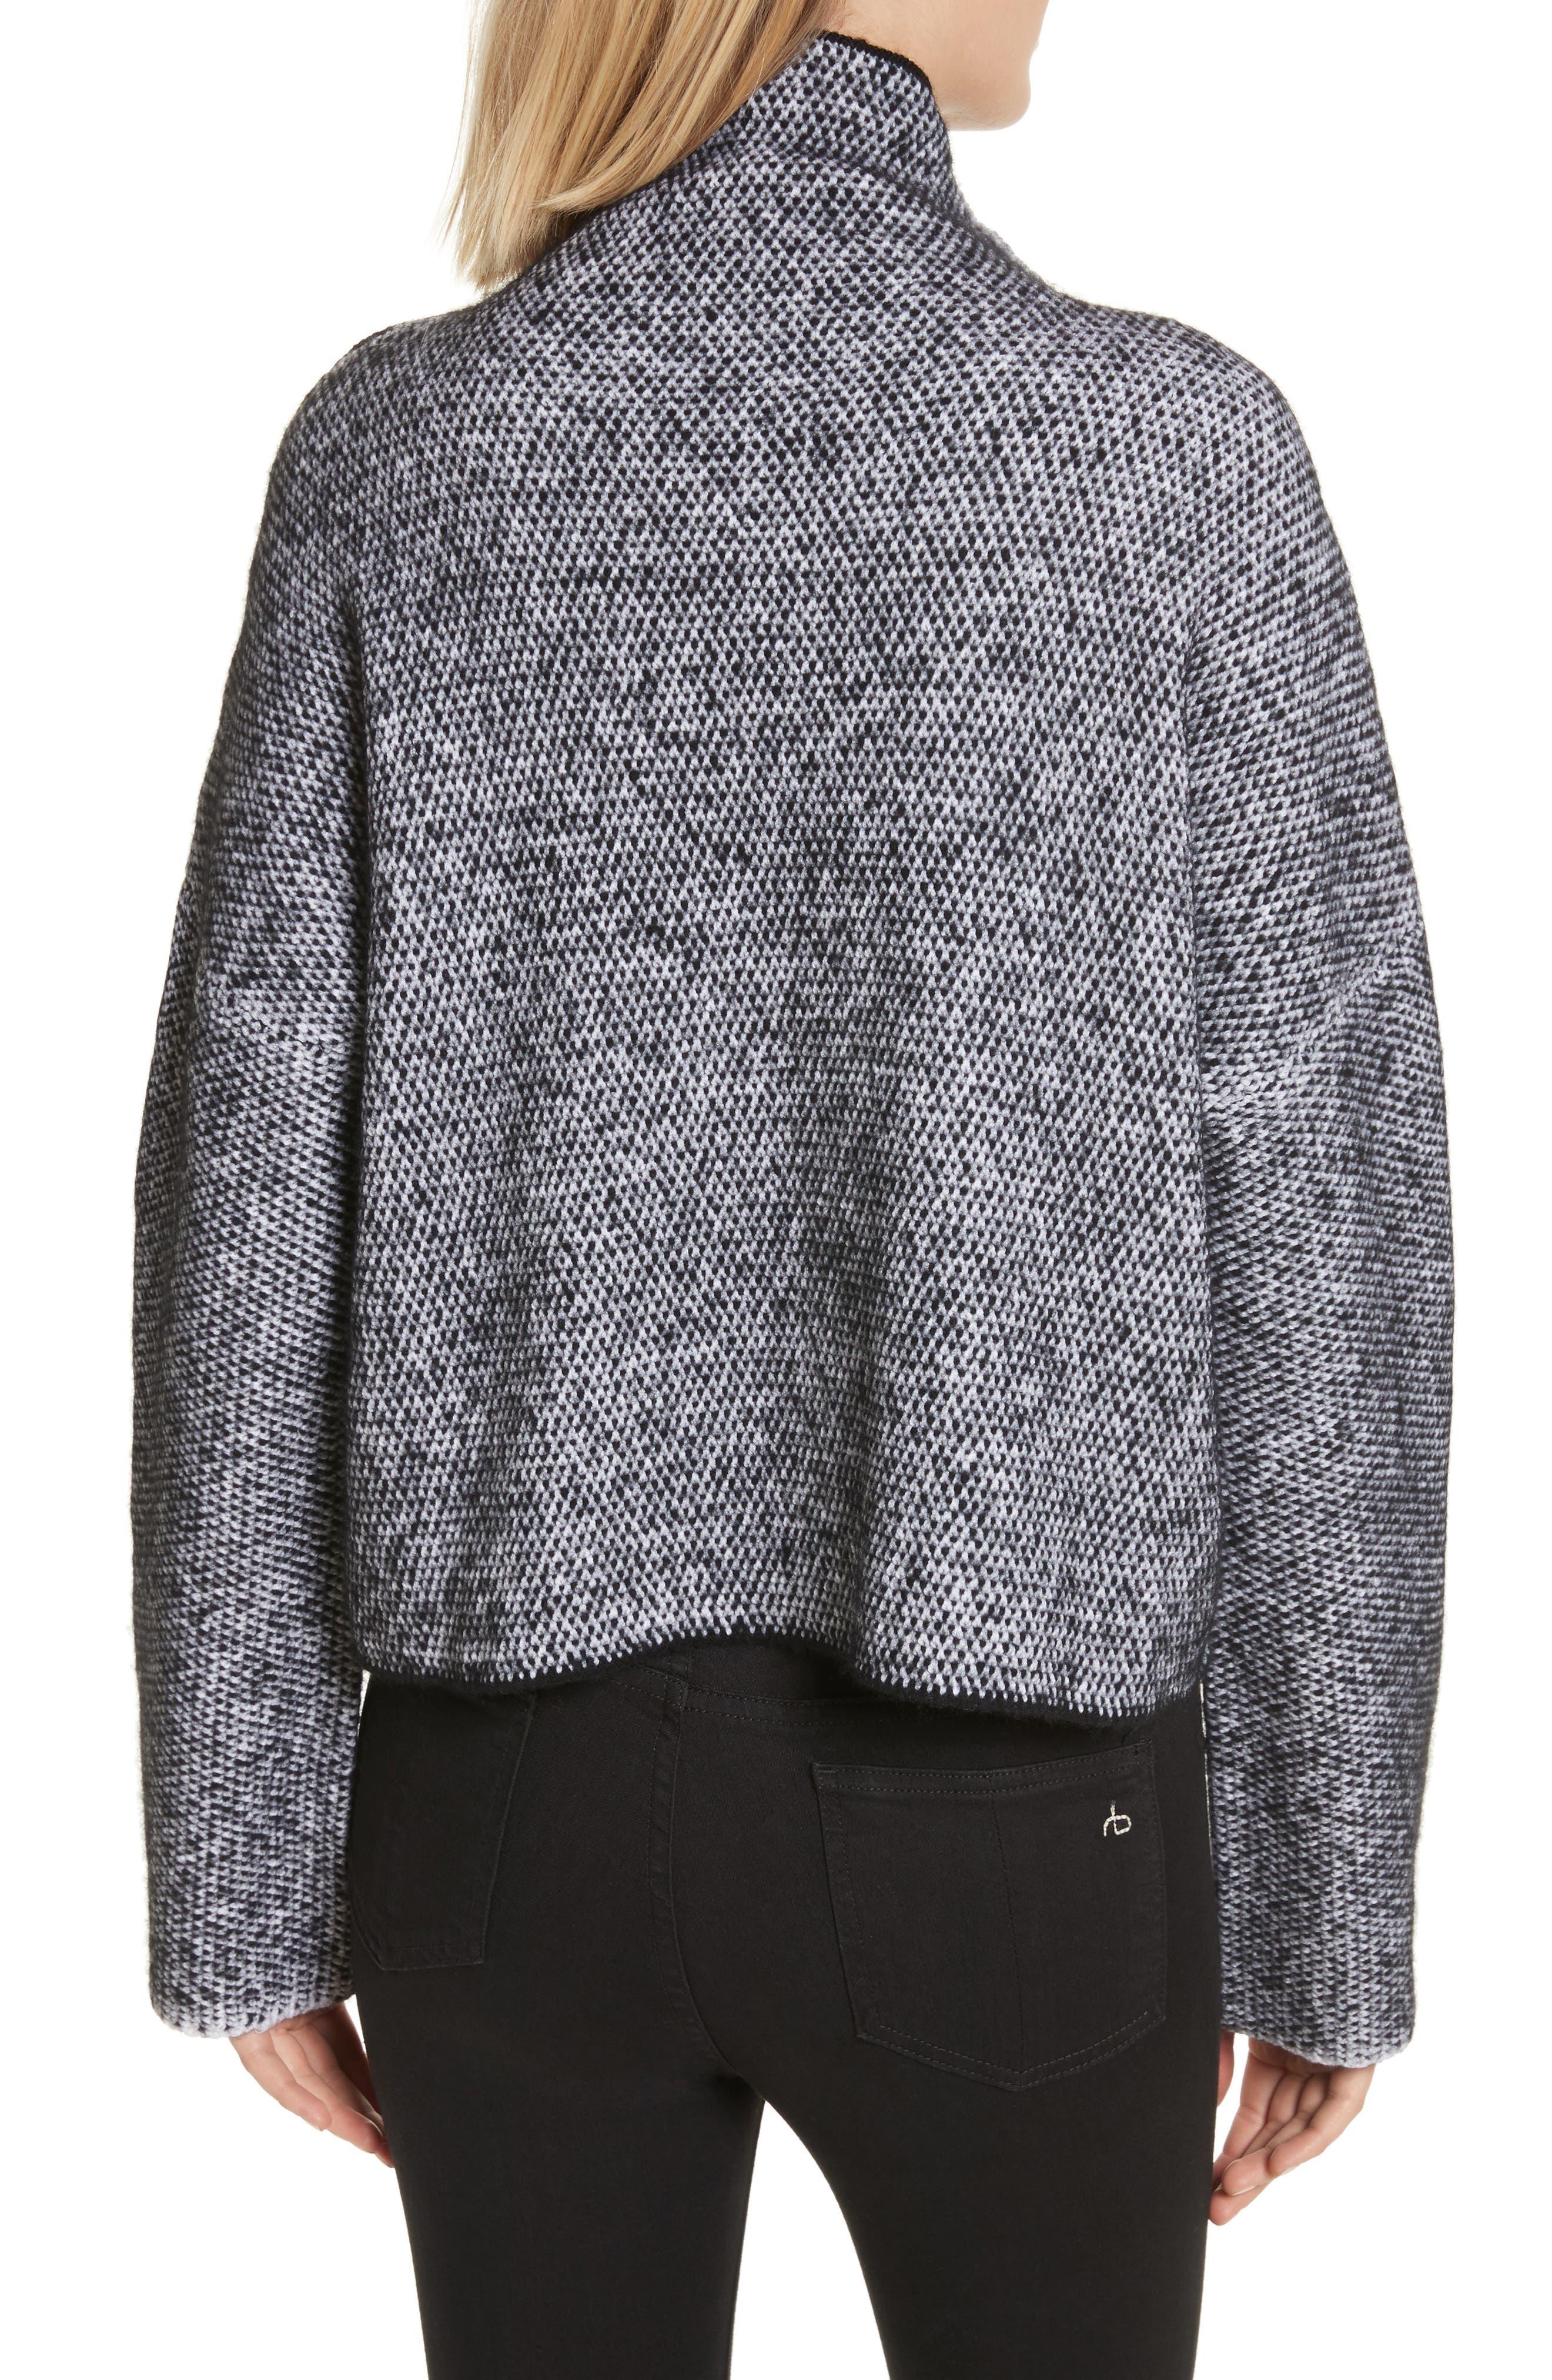 Robin Merino Wool Blend Sweater,                             Alternate thumbnail 2, color,                             001